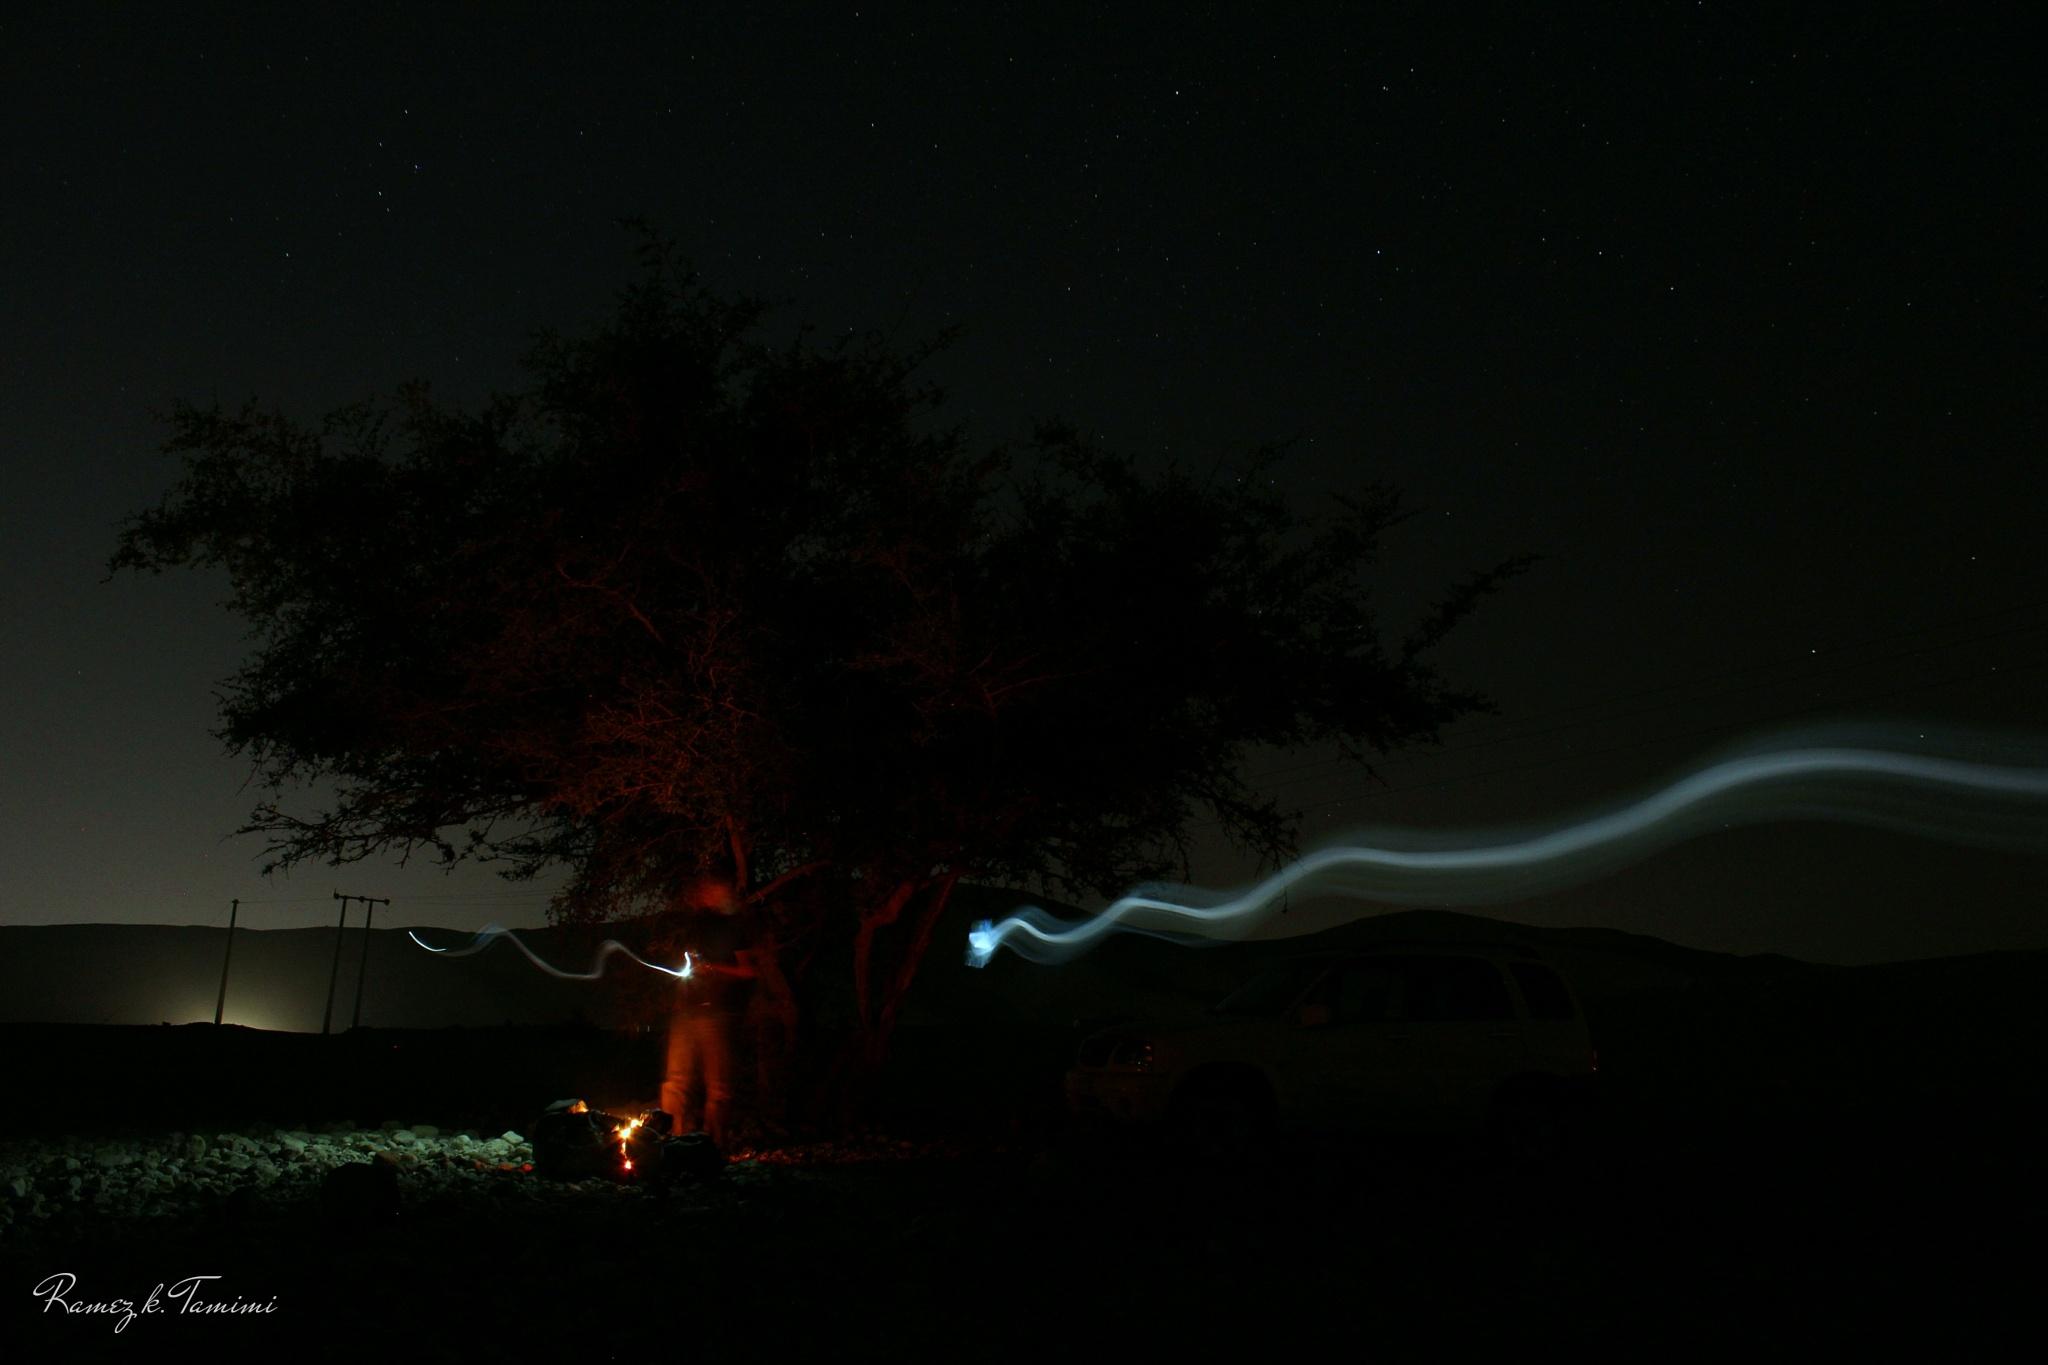 flying light by Ramez k. Tamimi